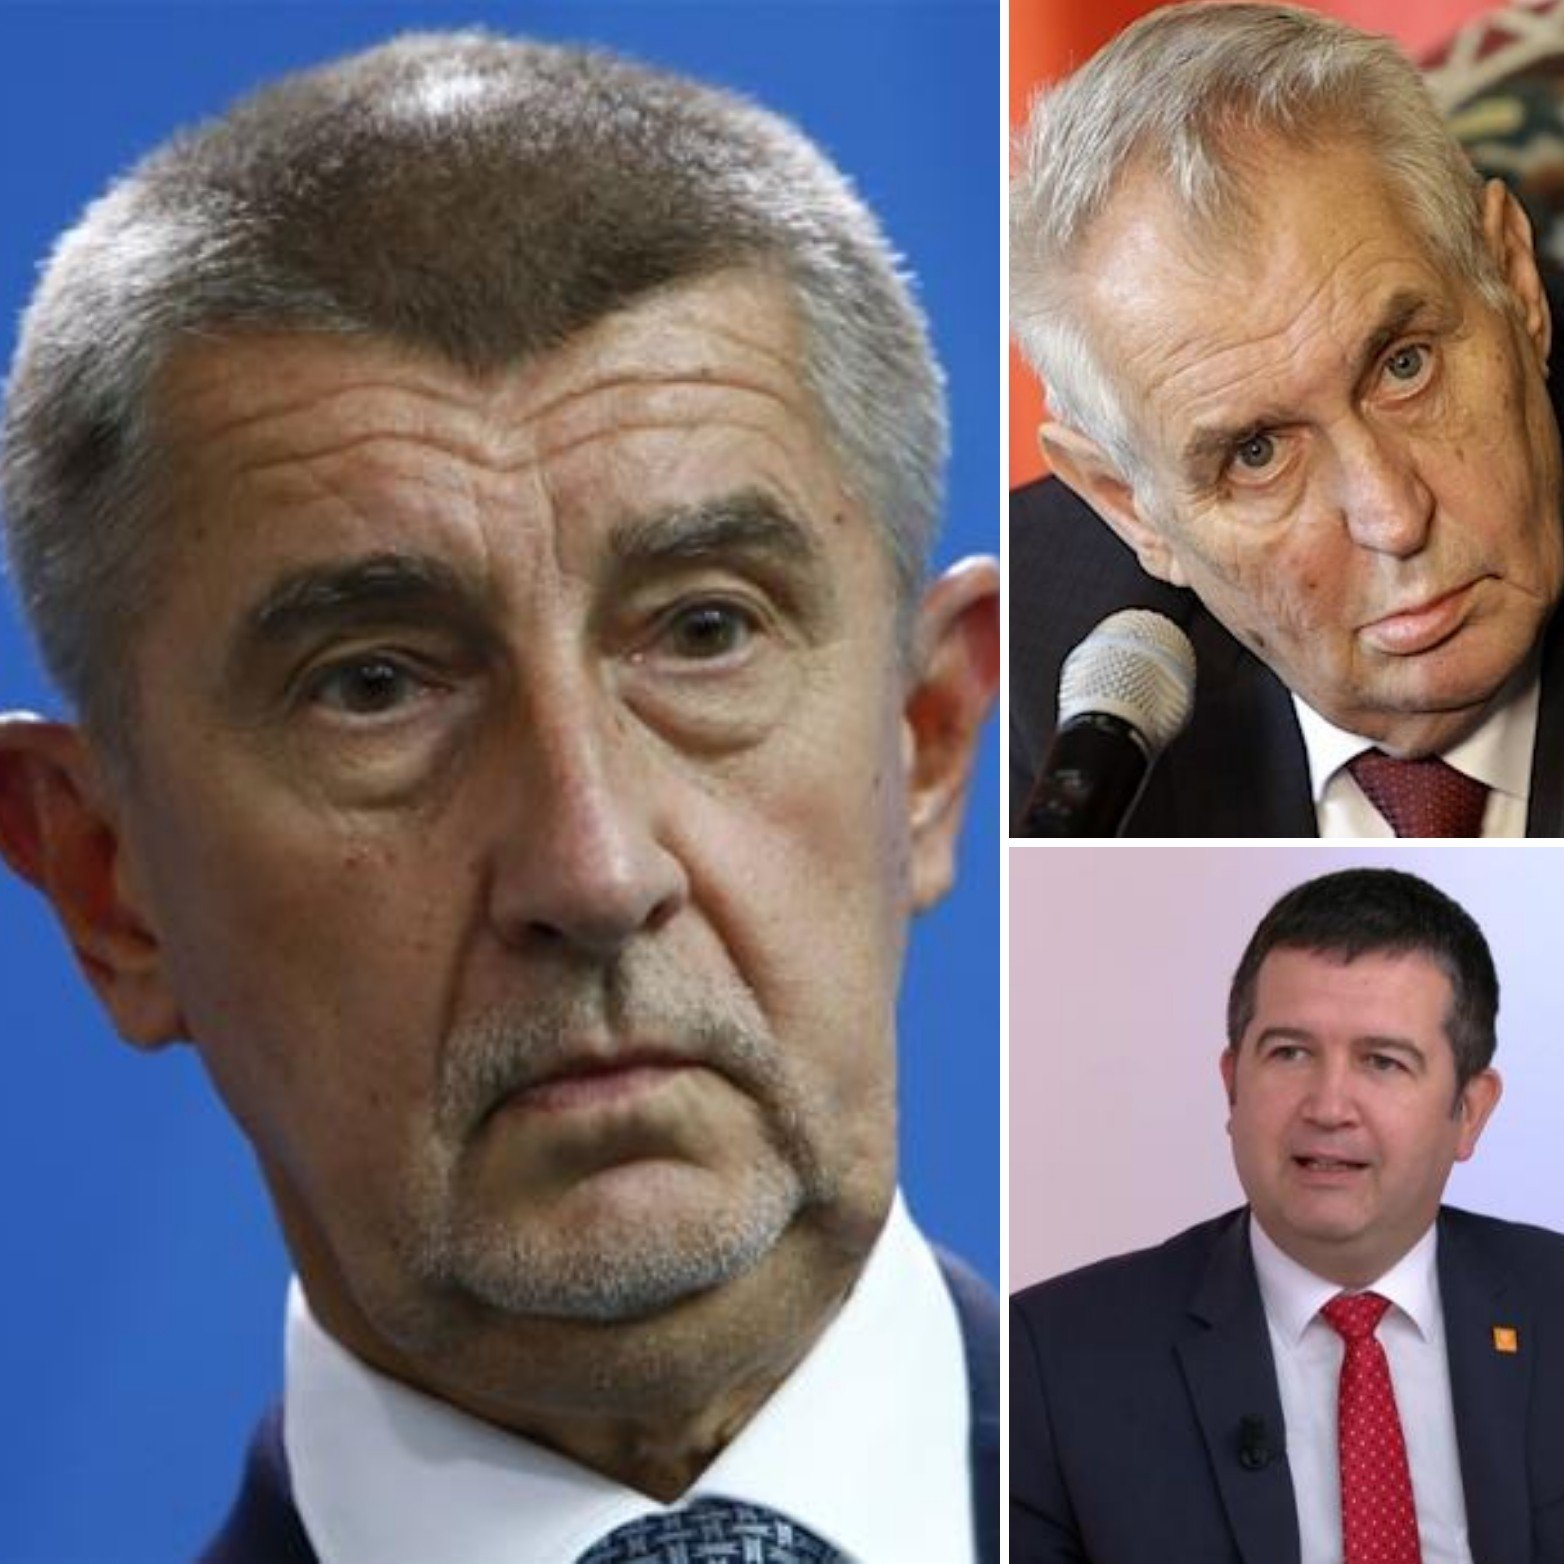 Crisis continues for Babis - Czech Points